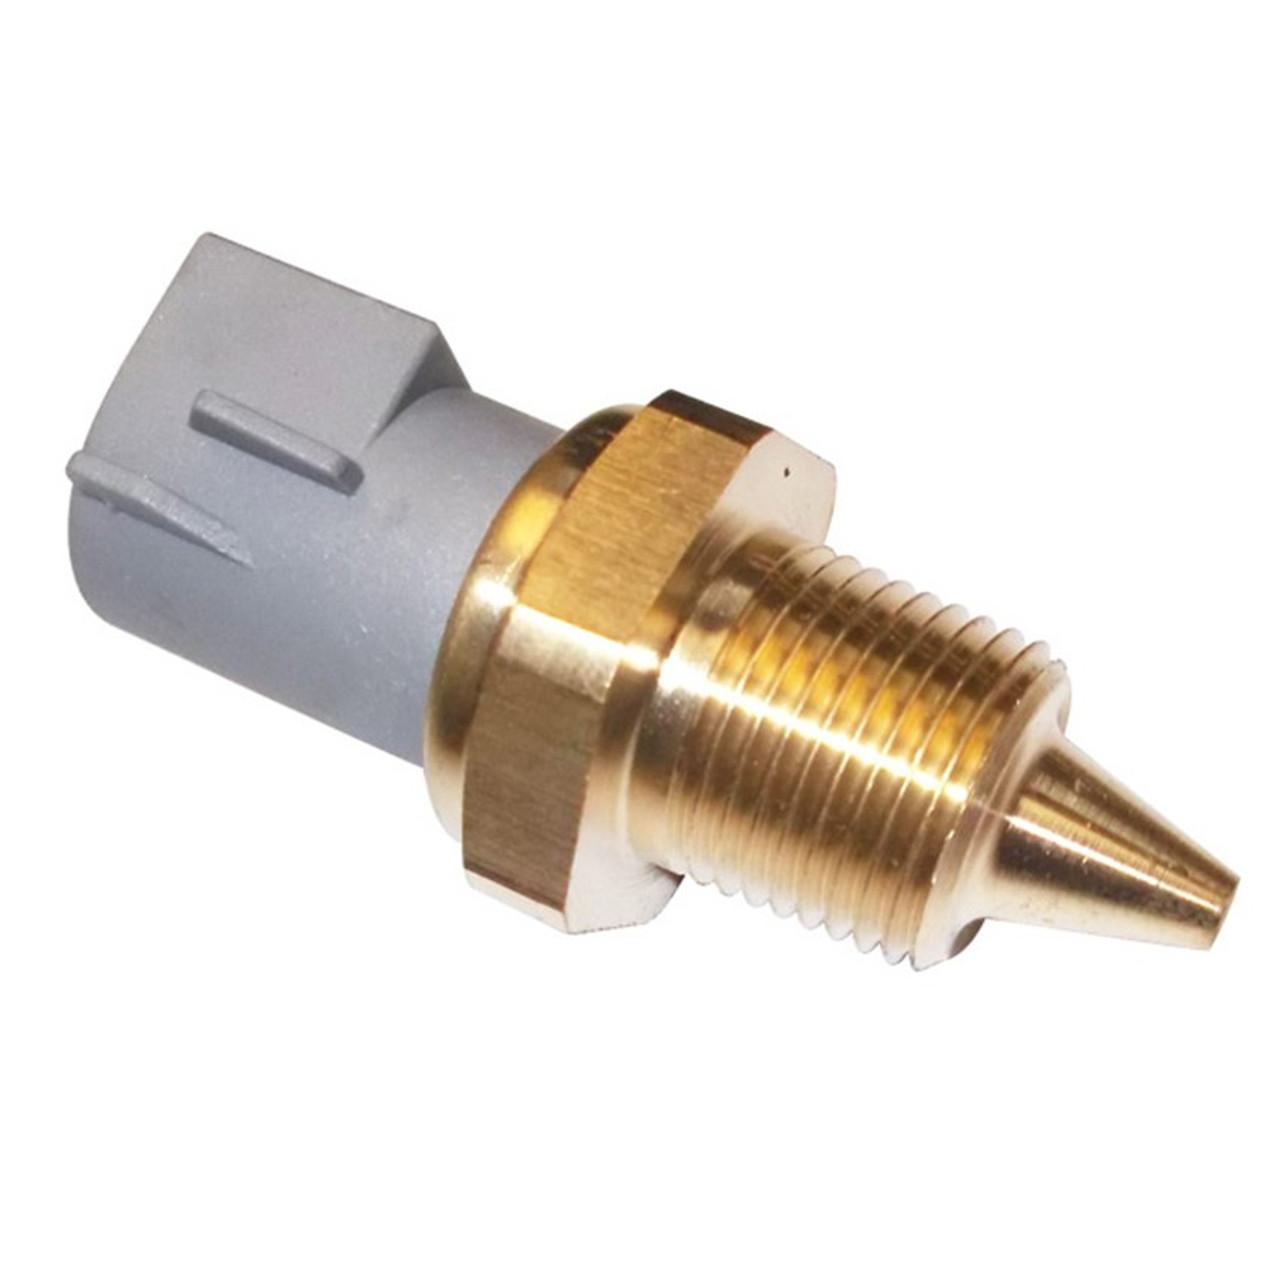 Navistar DT466 Coolant Temp Sensor | BTS061556